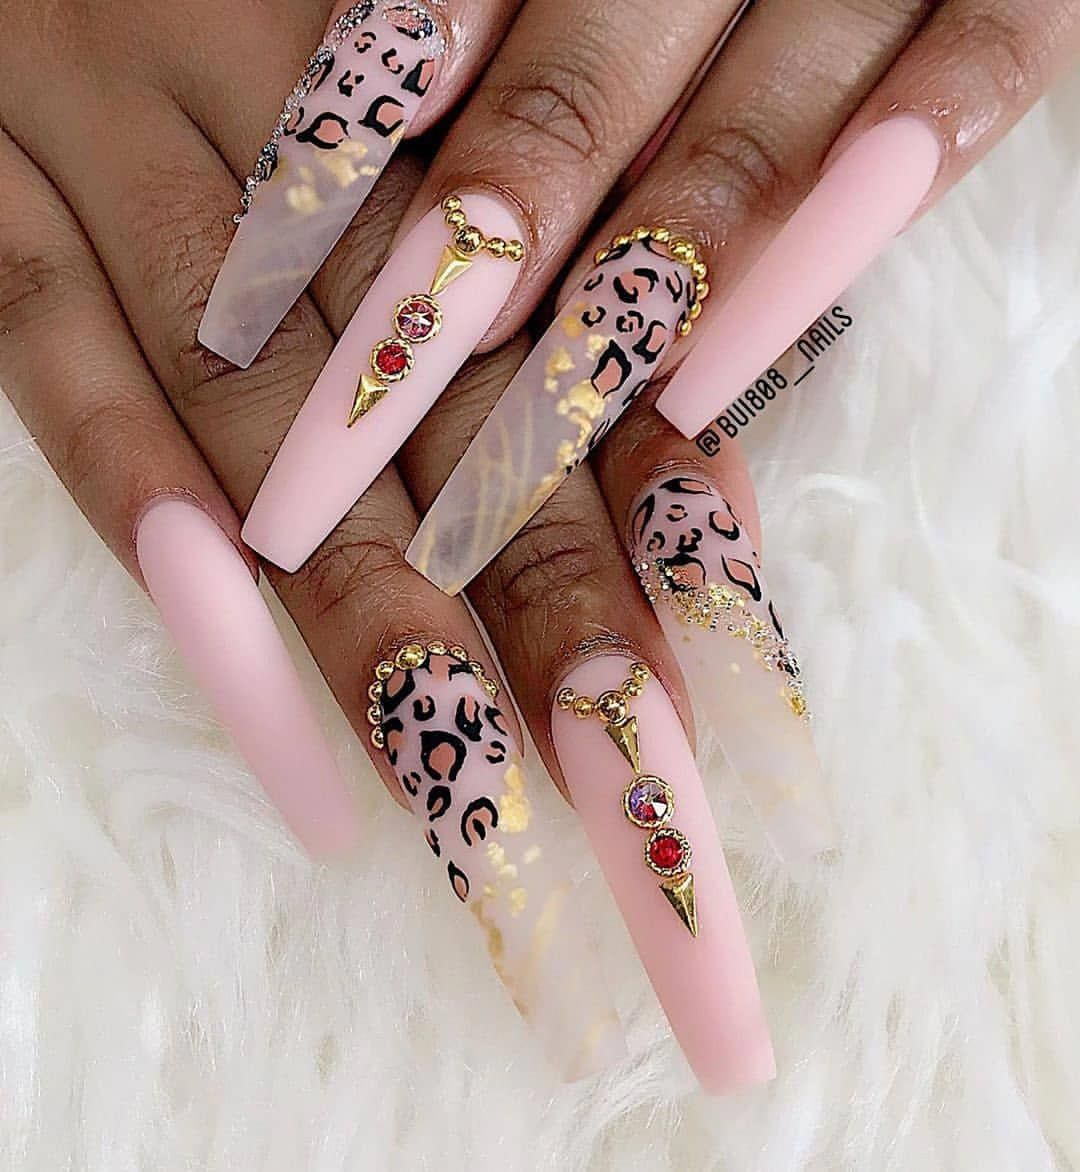 LOVE ALWAYS - My Nails